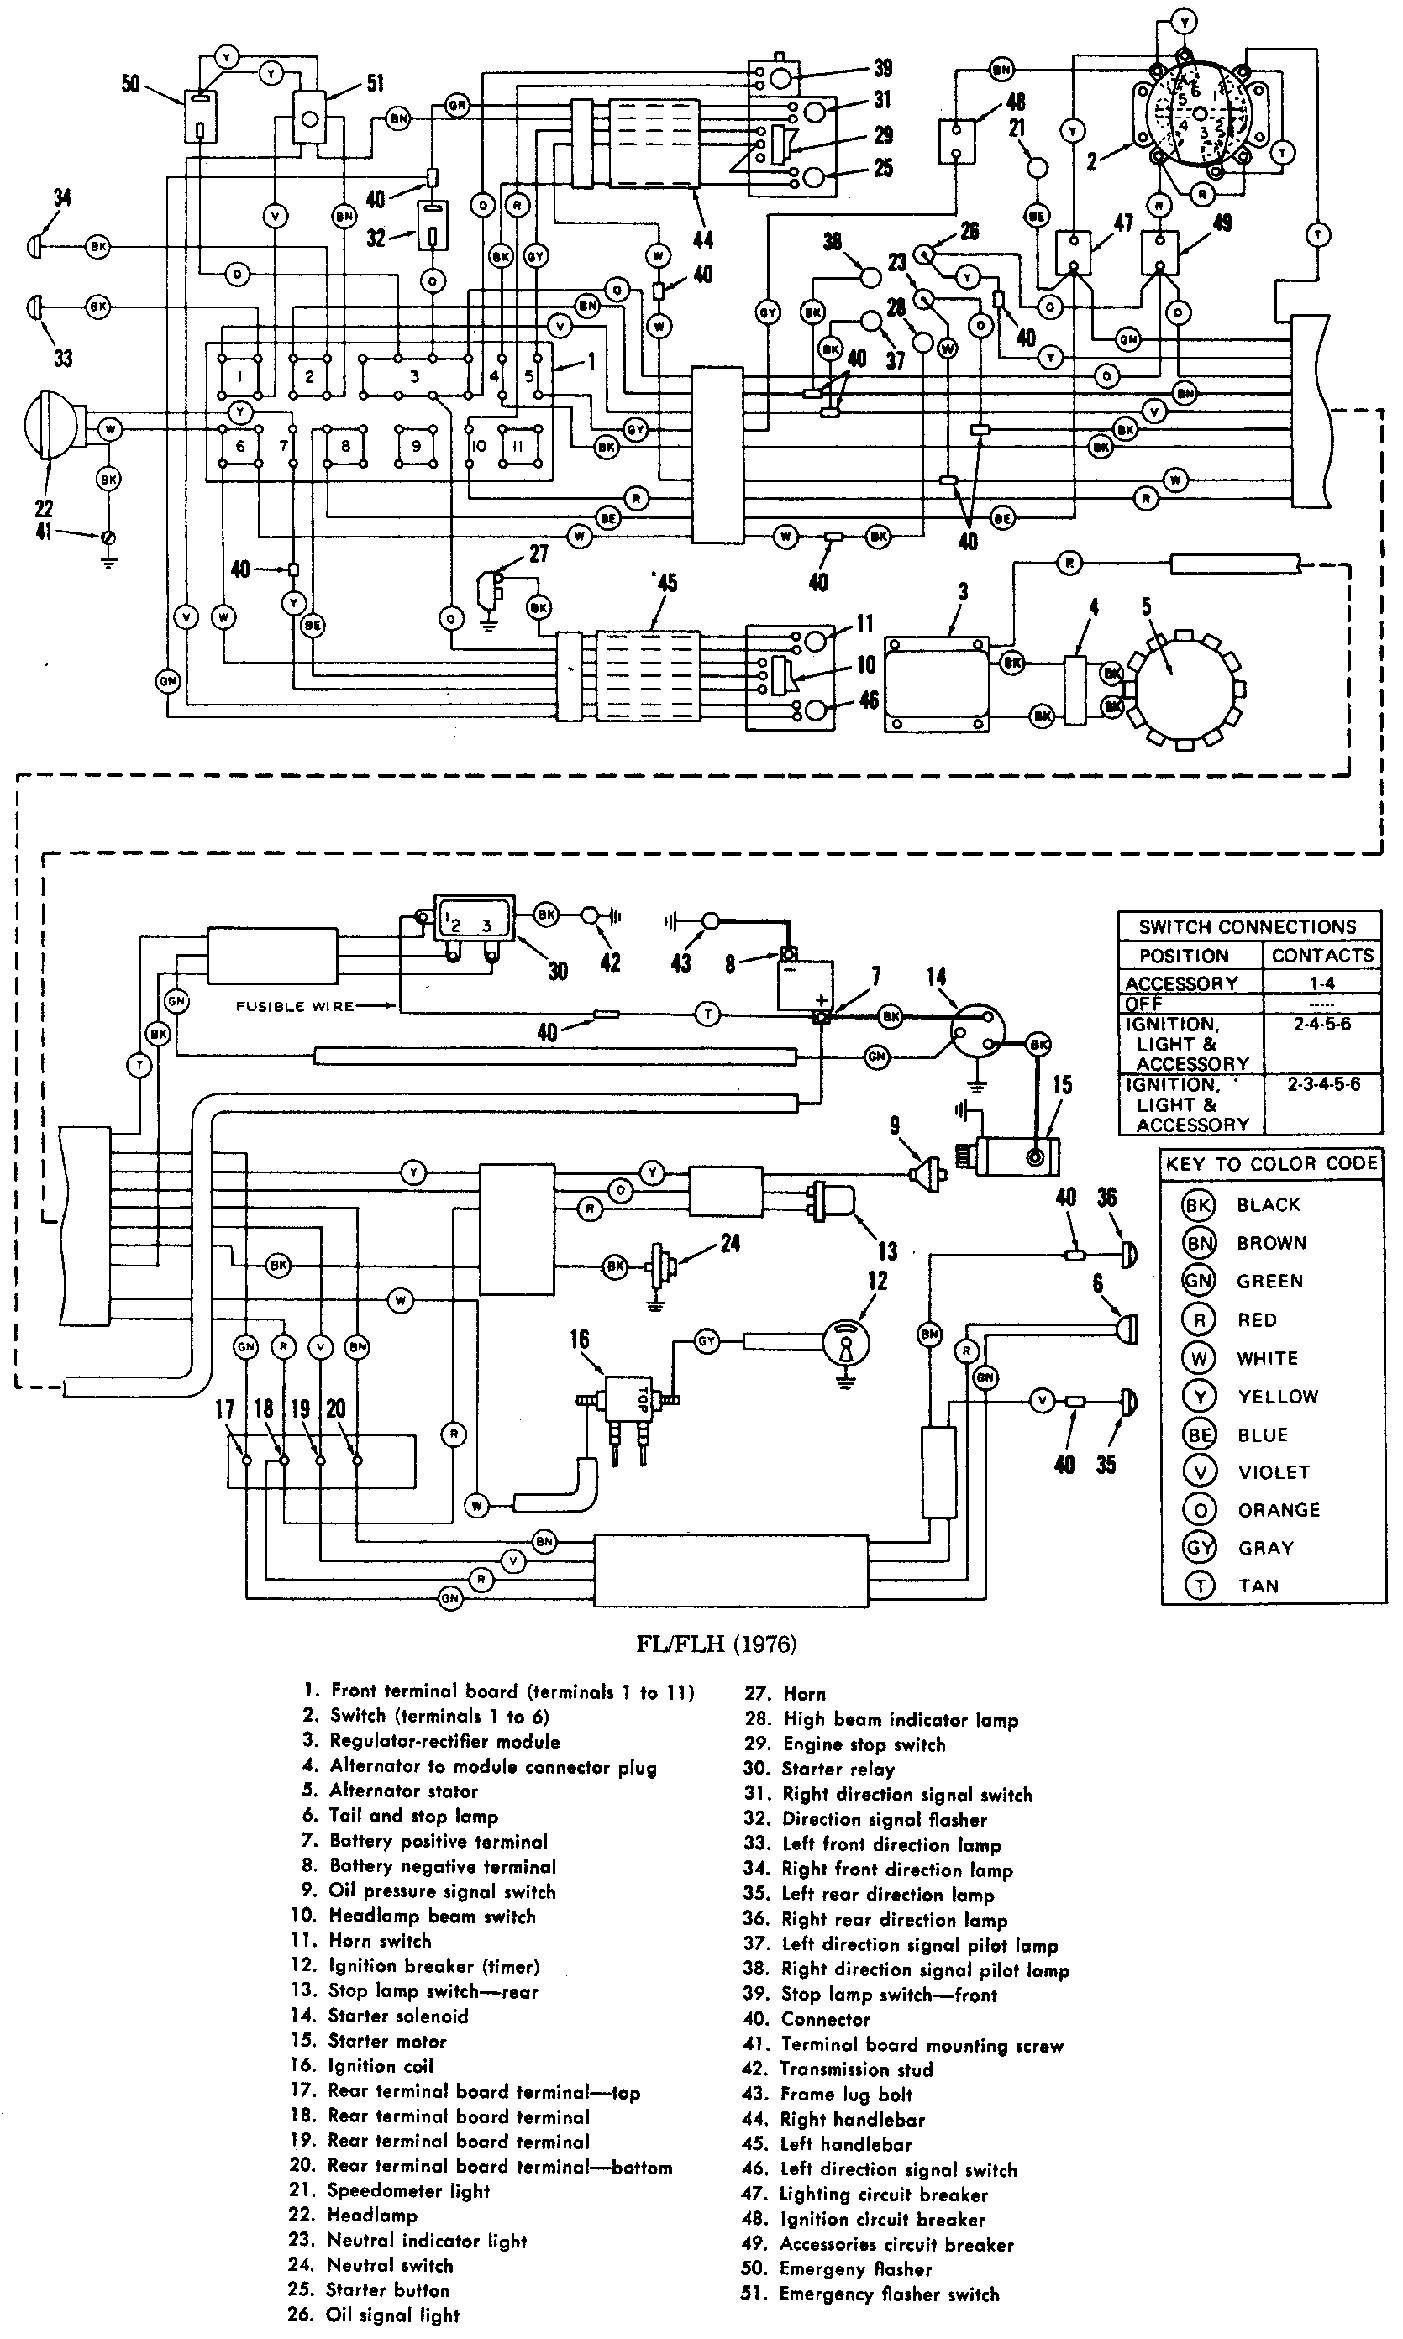 1993 Harley Davidson Fxr Wiring Diagram: Harley Davidson Navigation Wiring  Diagram - Wiring Diagrams Schematicsrh